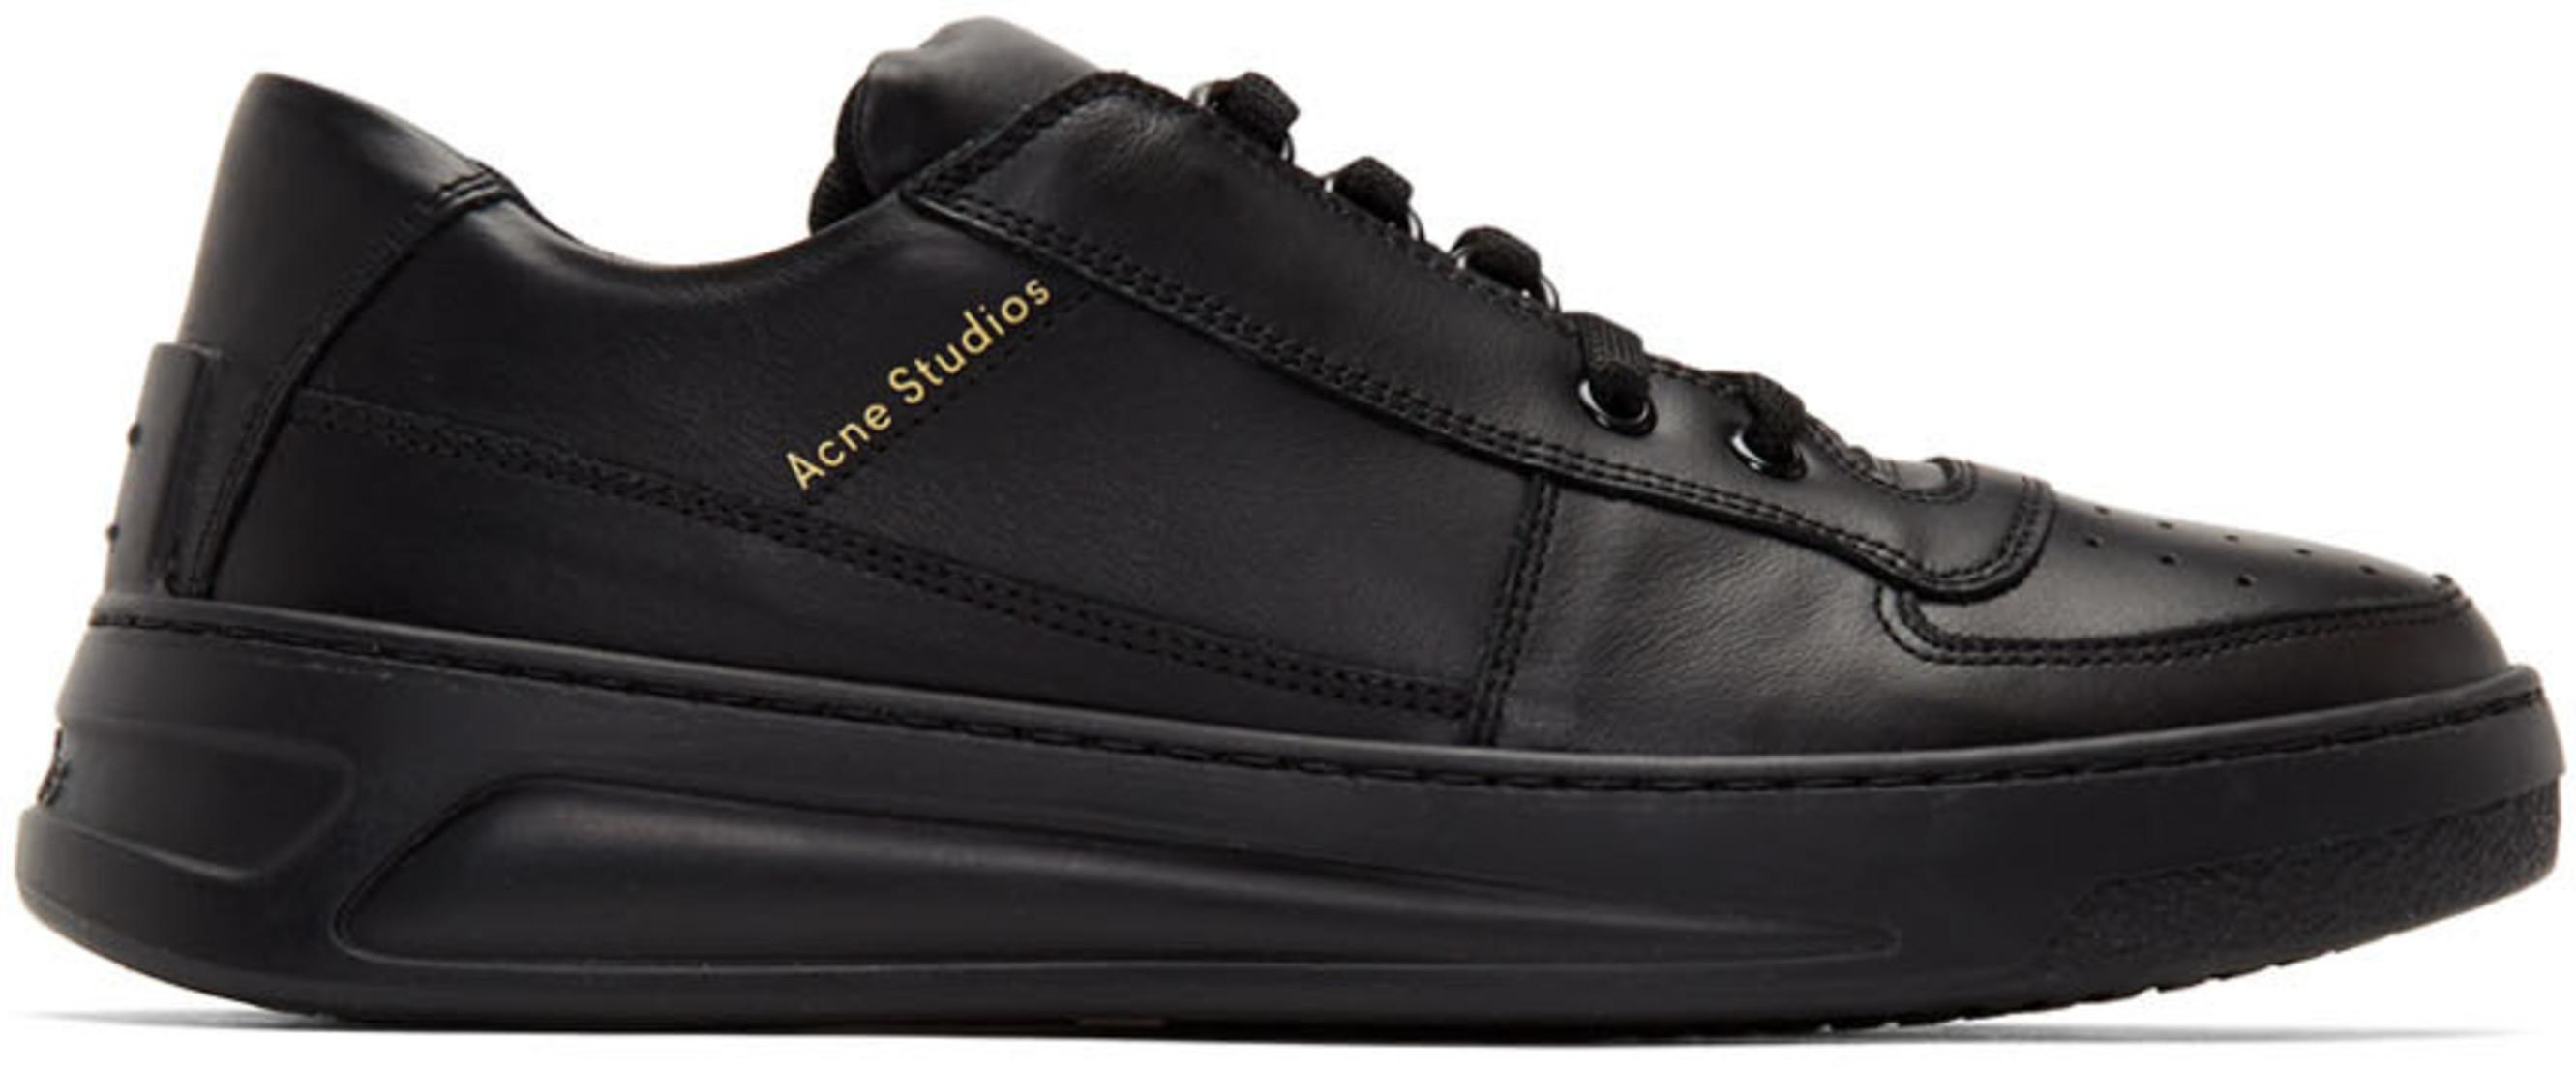 847ecd8cea99b5 Designer shoes for Men